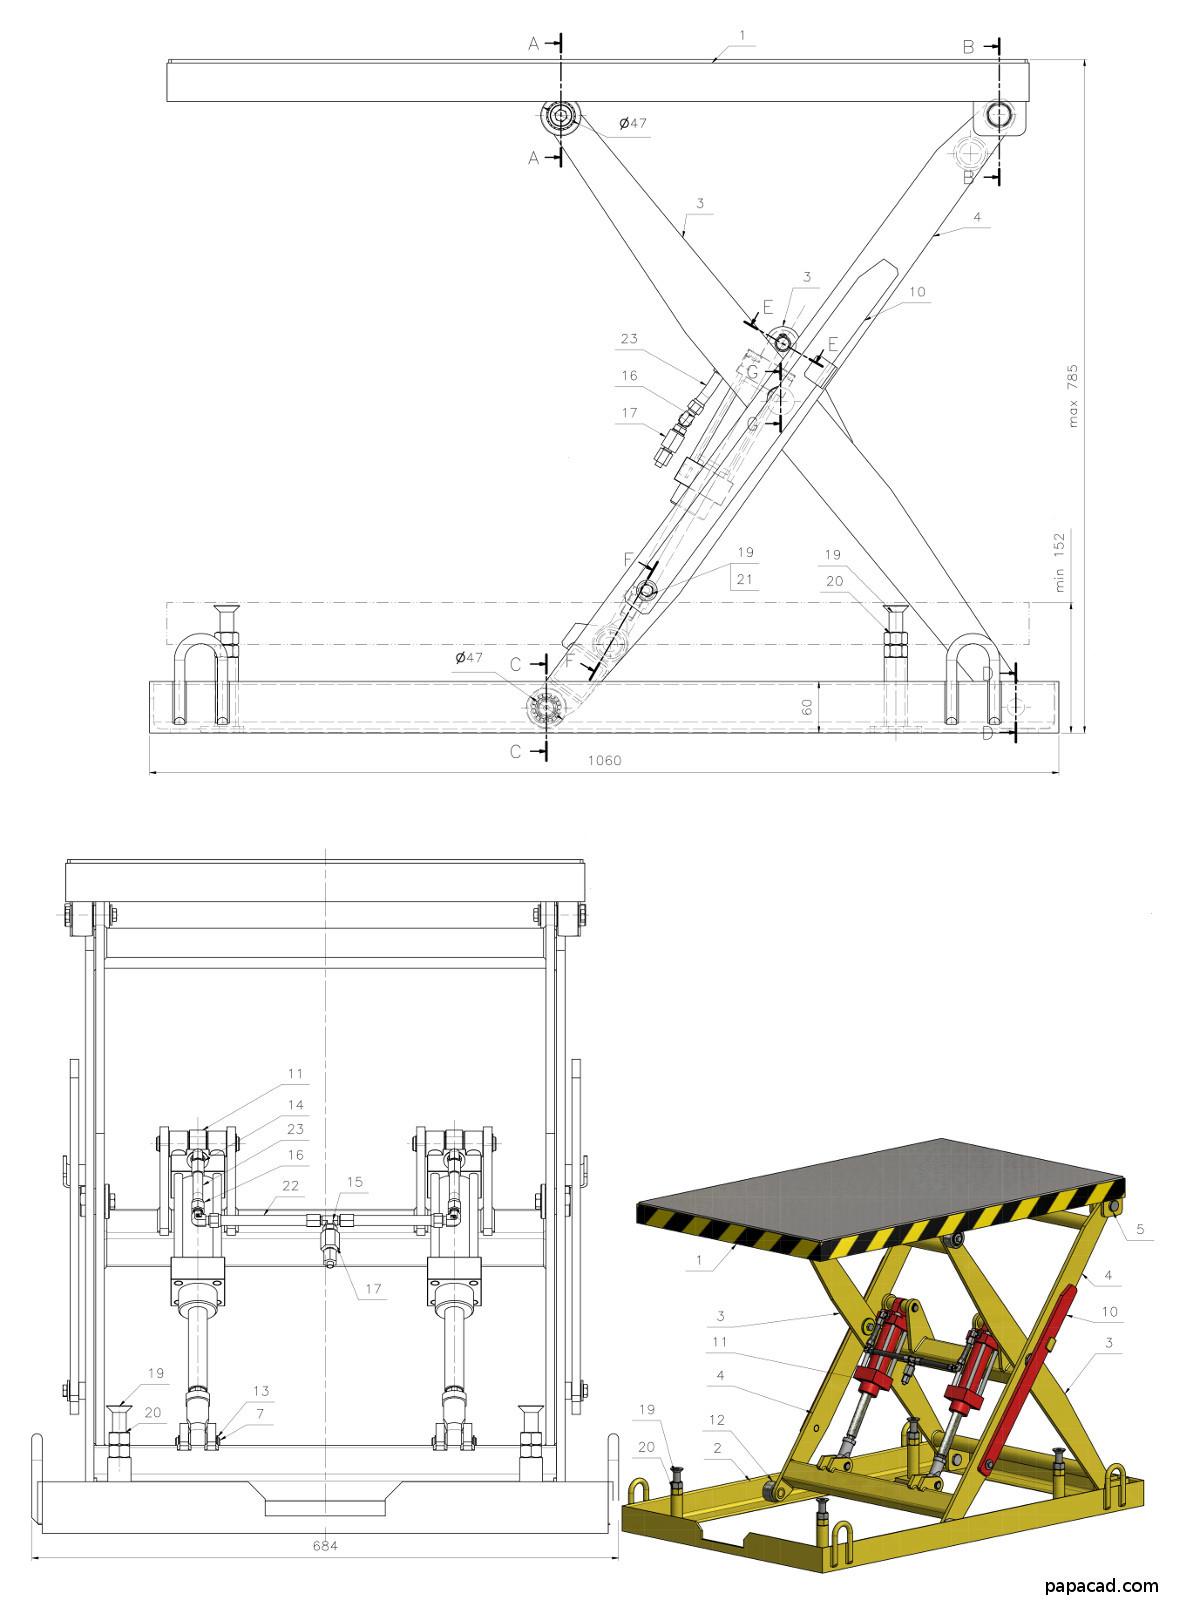 Diy scissor lift table - Download 3D and 2D CAD complete documentation